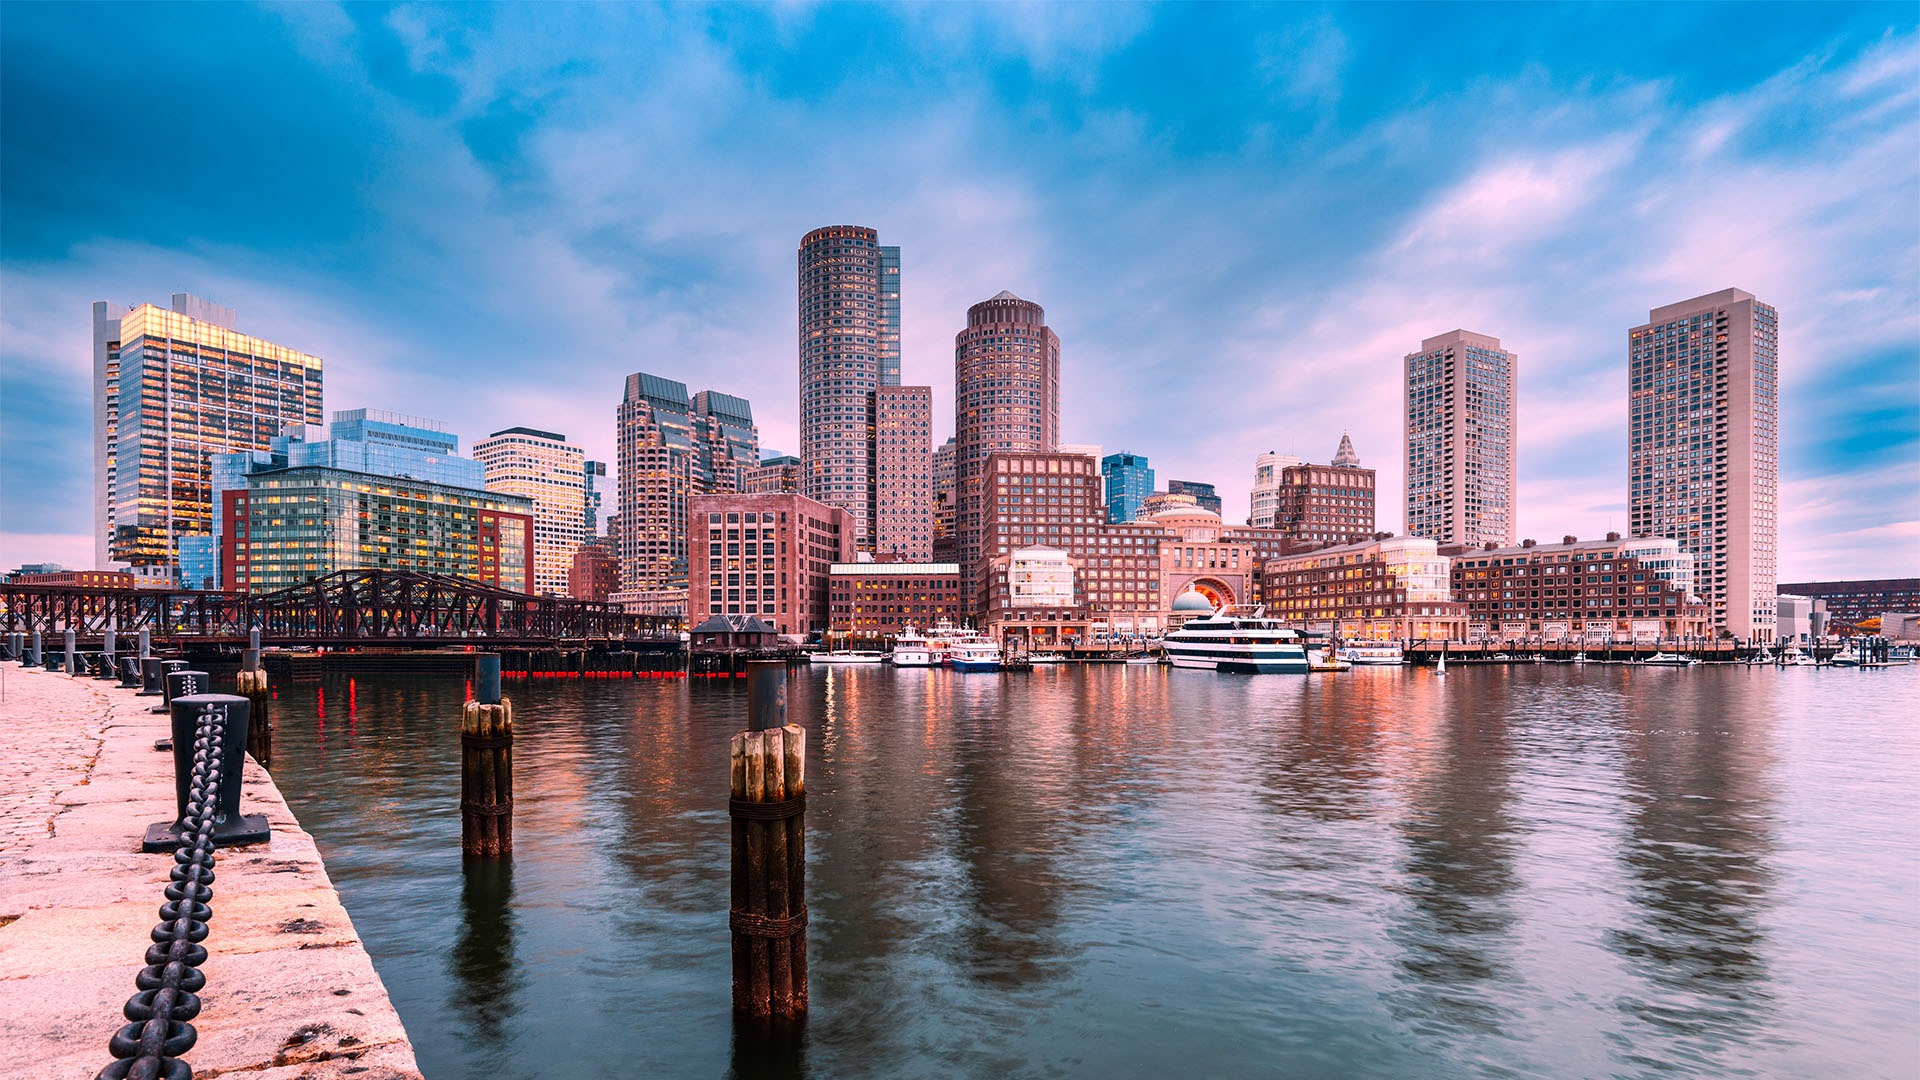 Boston, Massachusetts, USA city skyline at the harbor.